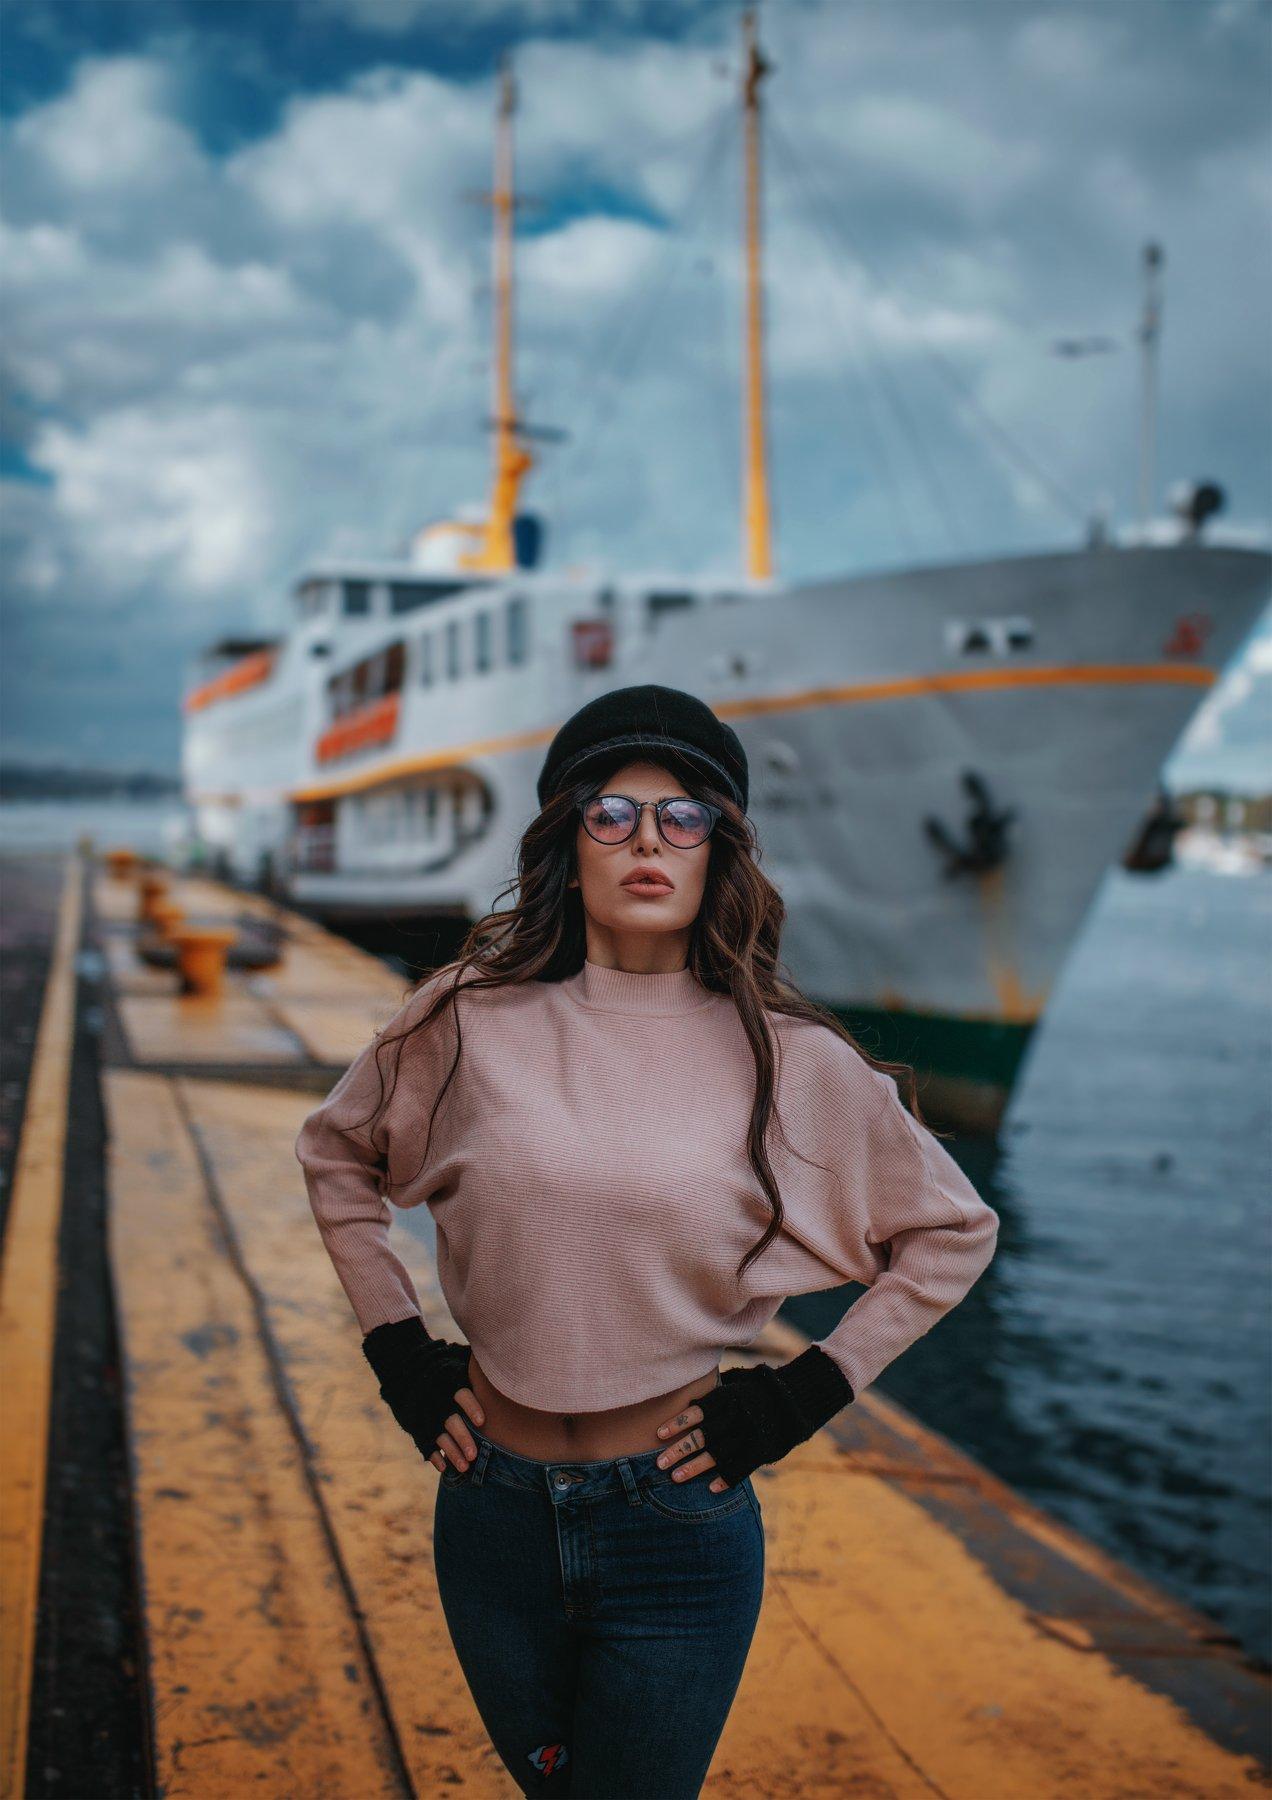 #portrait #beautiful #model #russia #moscow # #canon #sigma #natural #light #портретарт #модель #portrait #art, Hakan Erenler